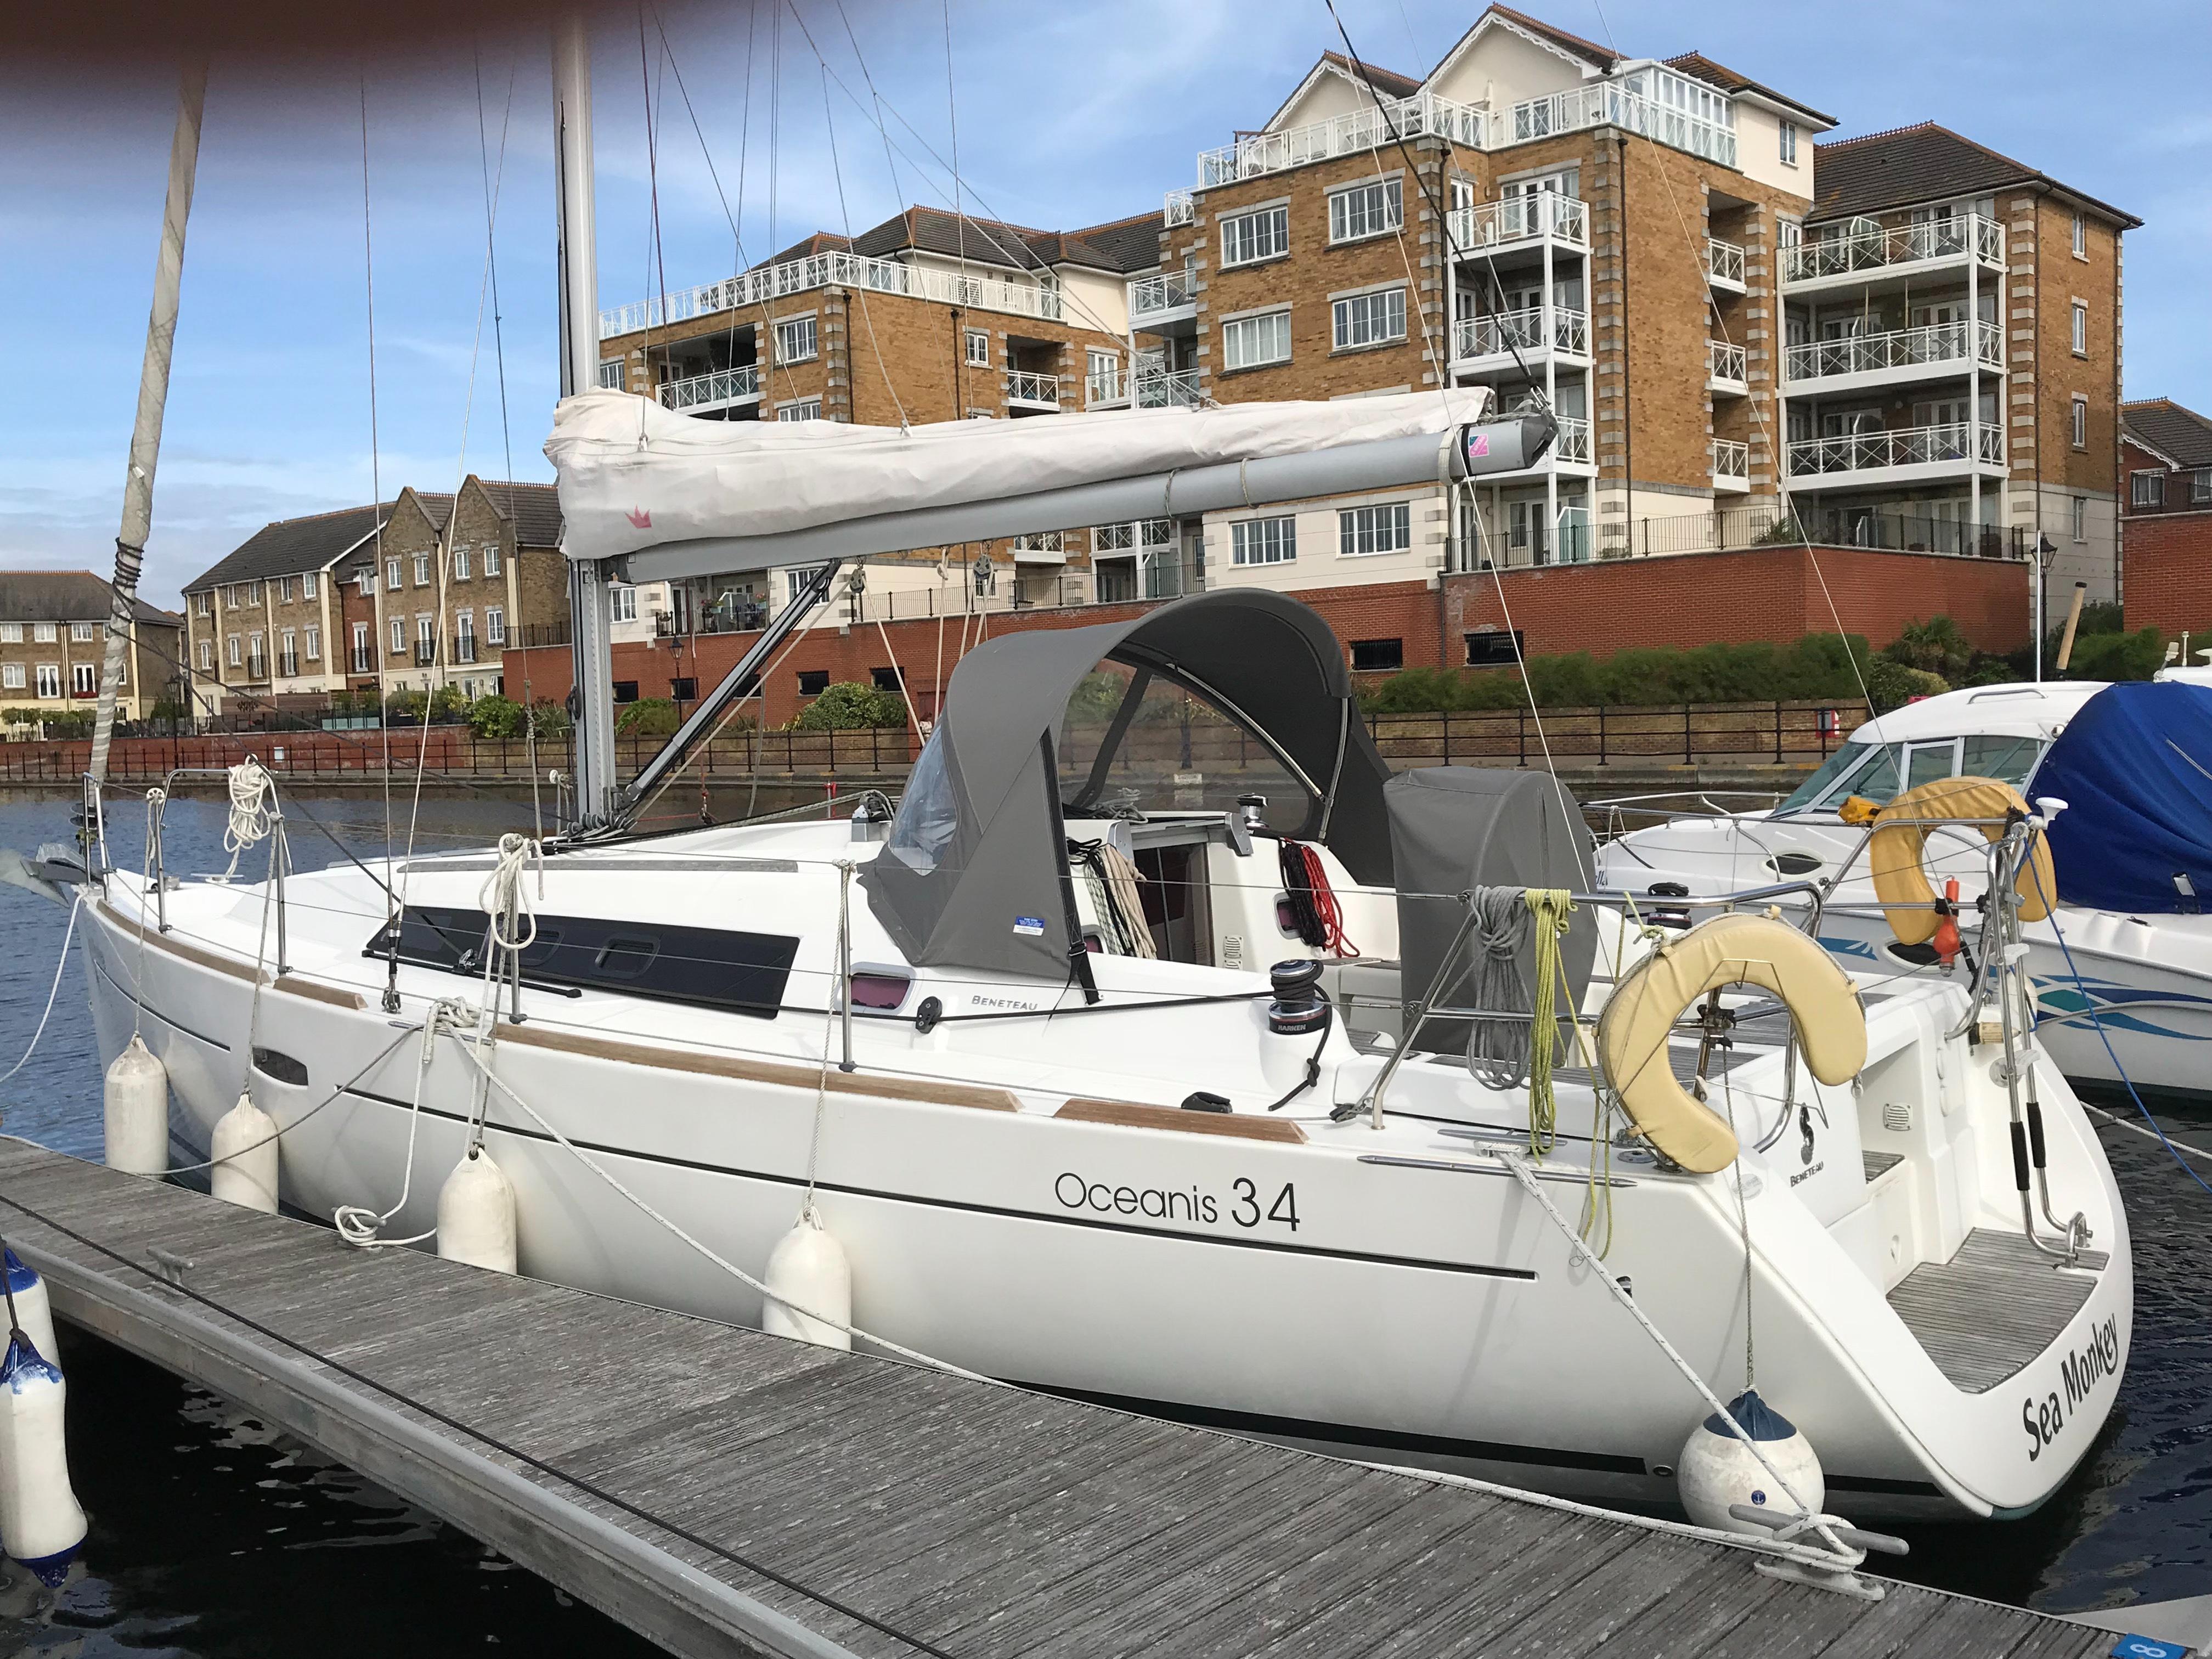 Beneteau Oceanis 34 For Sale Bates Wharf